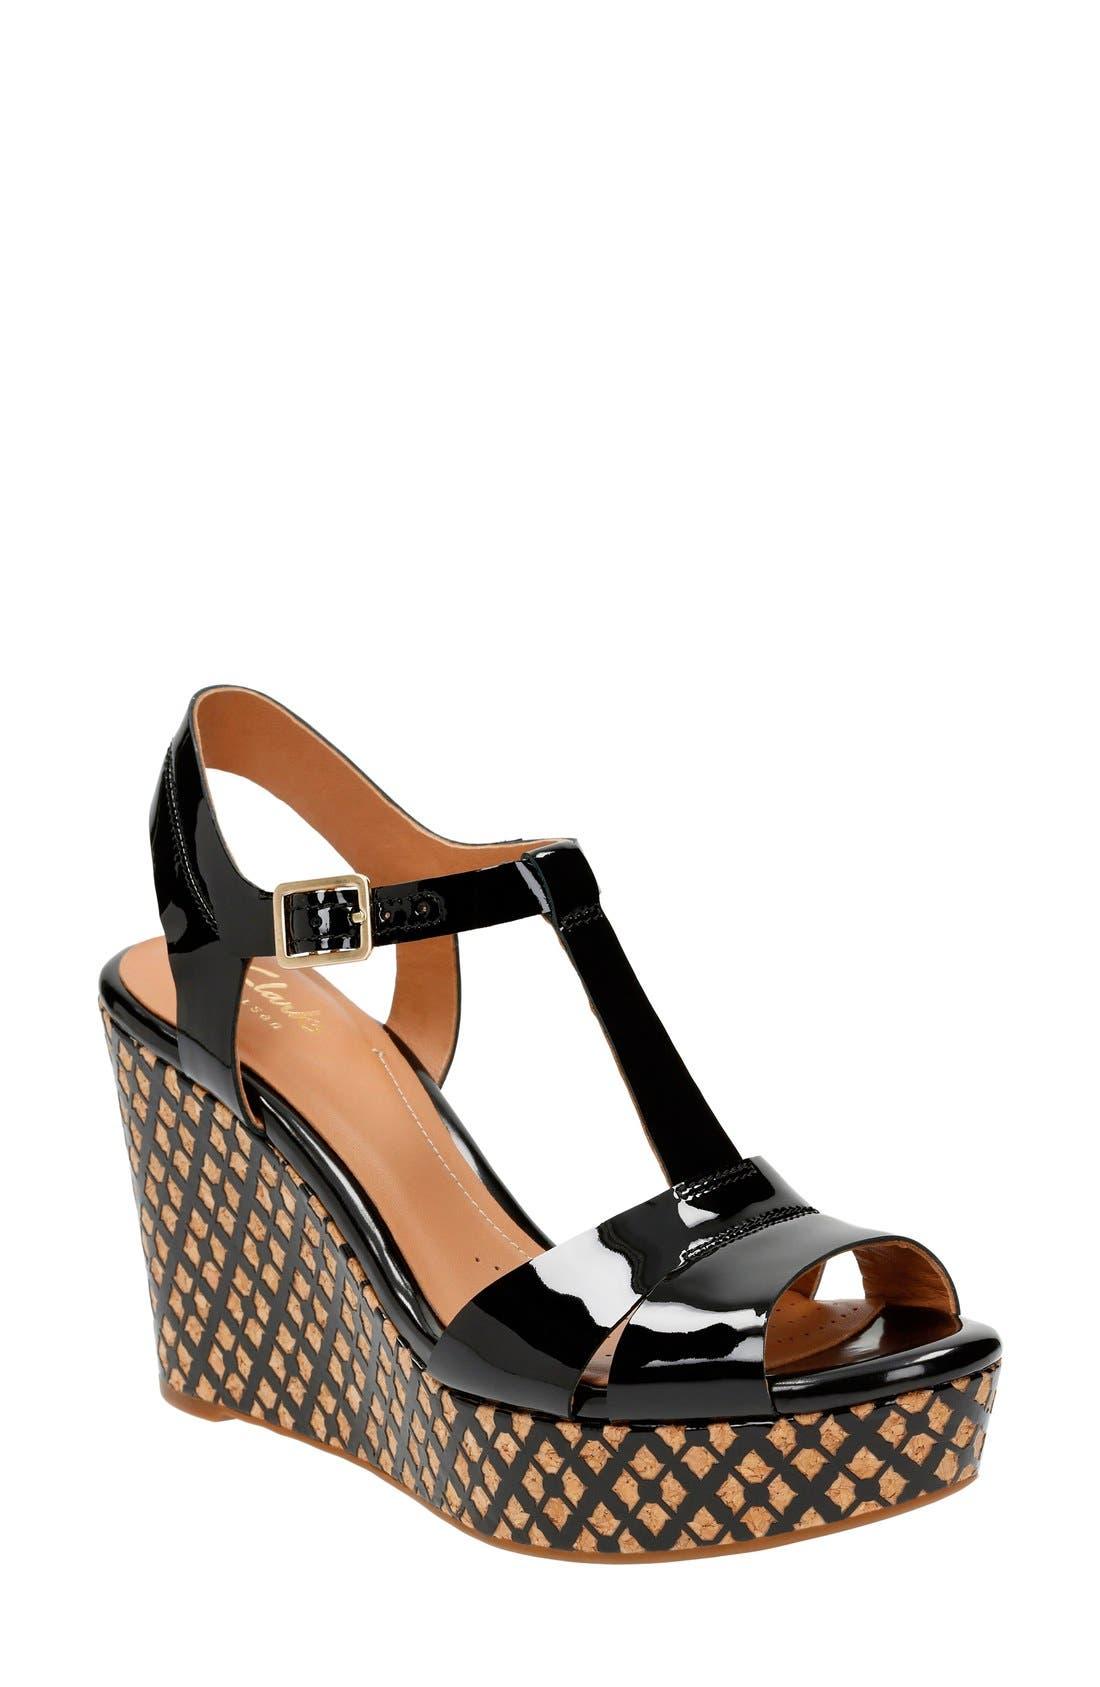 'Amelia Roma' Wedge Sandal,                             Main thumbnail 1, color,                             017